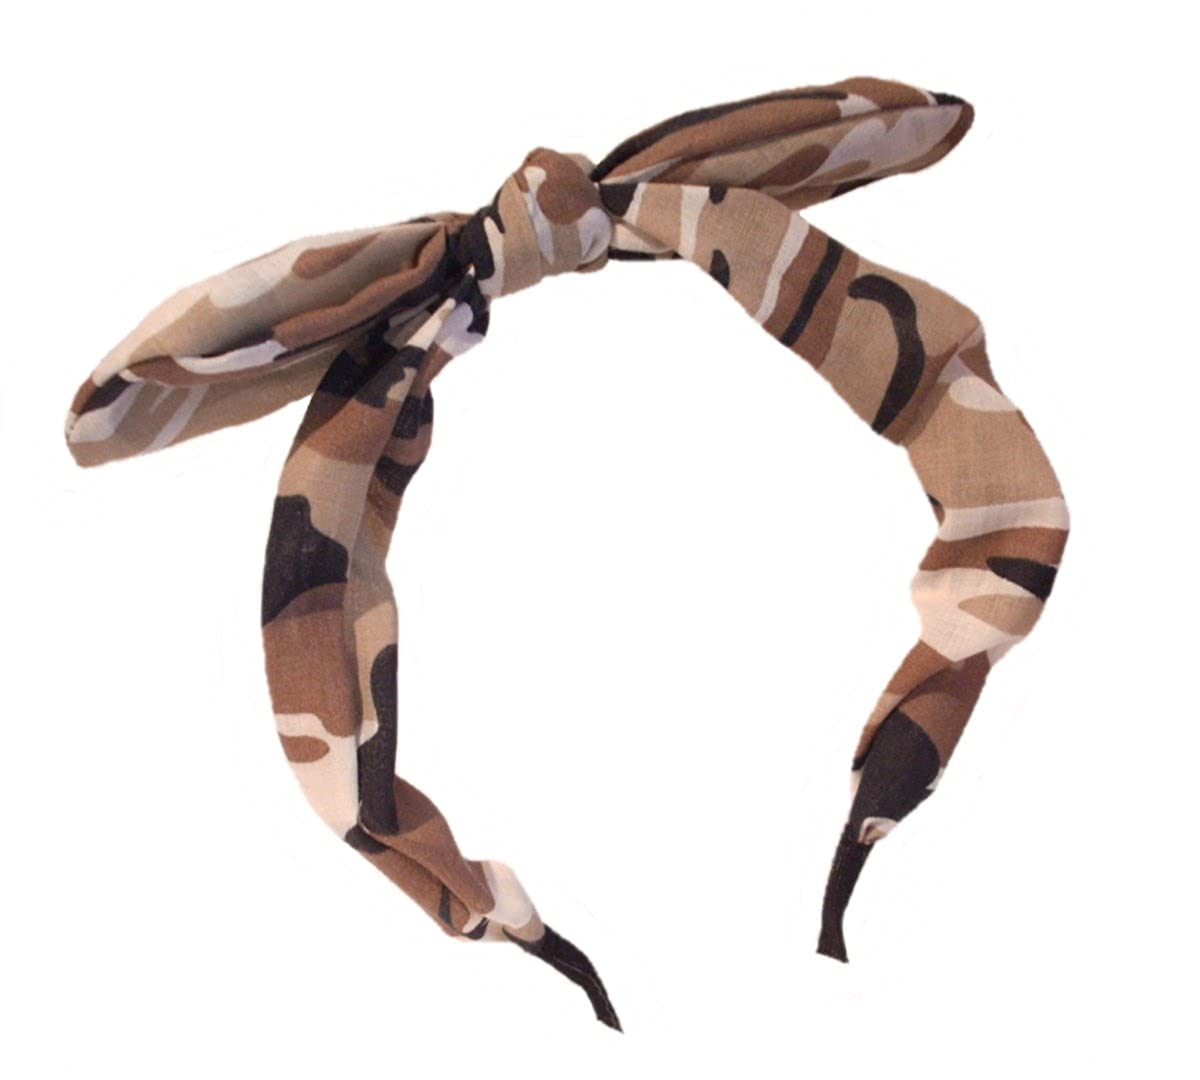 New Wide Ribbon Bowknot Alice Headband Hairband Bunny Rabbit Ears Wire Bendy Bow Choice of Colour